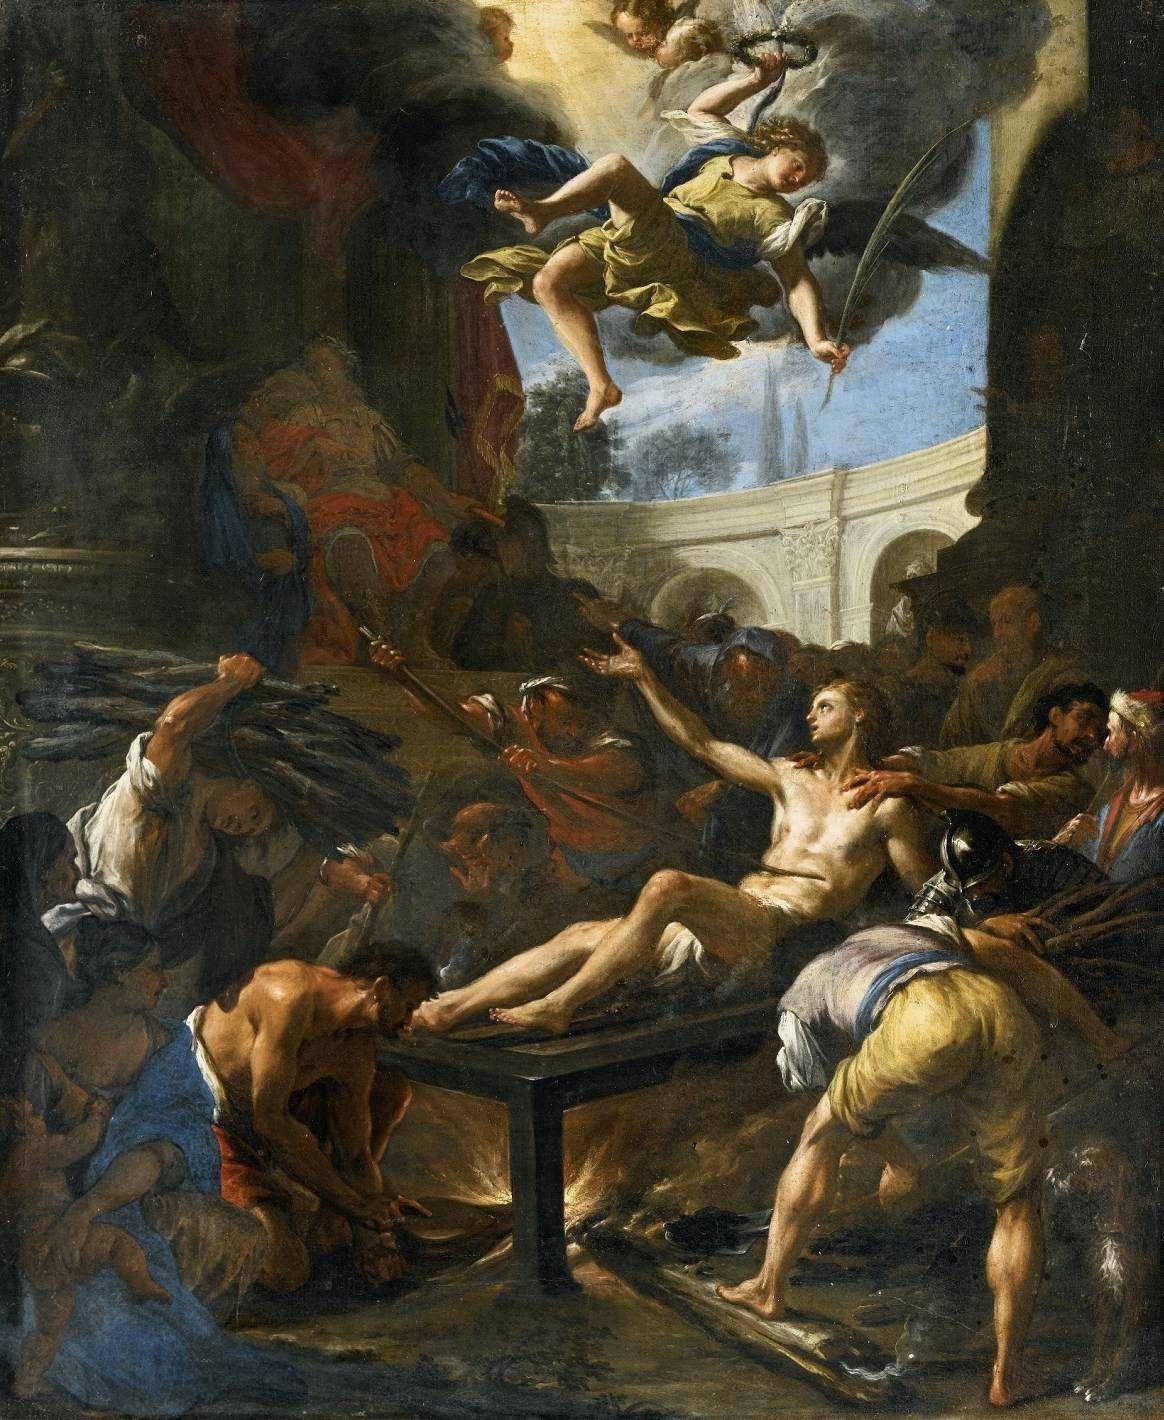 http://www.wga.hu/art/t/trevisan/lawrence.jpg Martirio de San Lorenzo, Trevisani, I. de San Felipe Neri, Turin, 1715